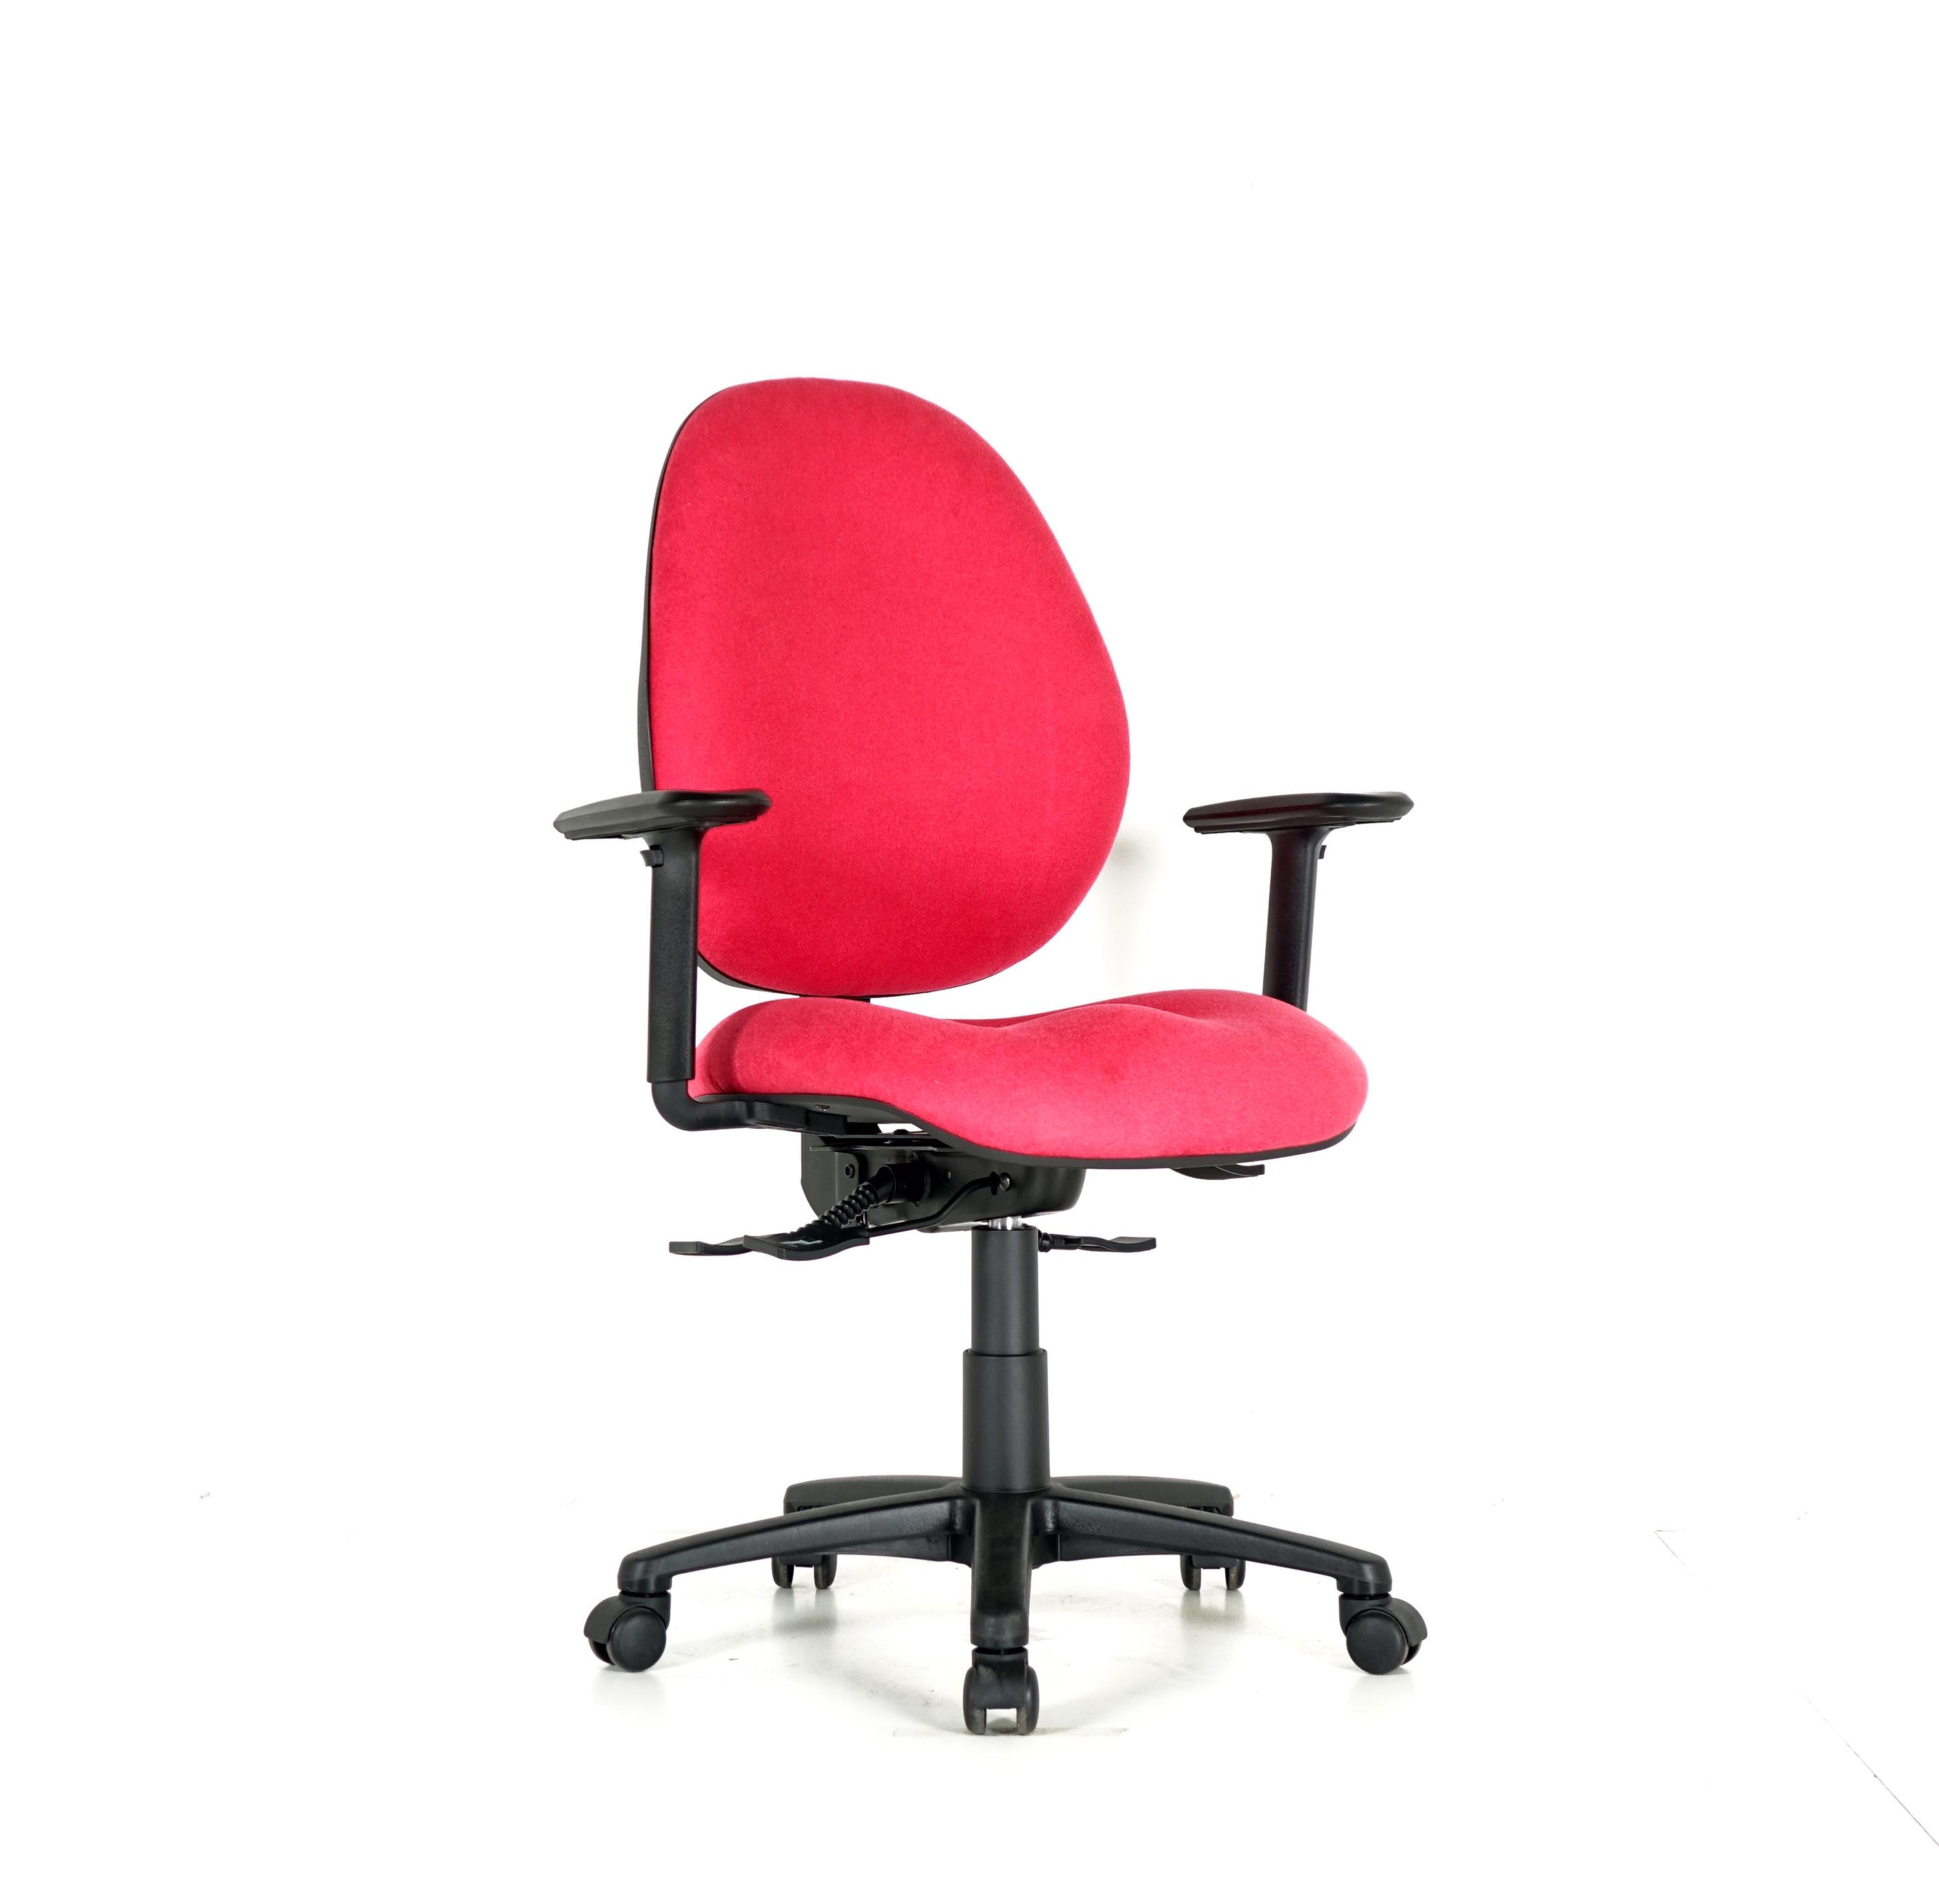 Malaga High Back Clerical Chair